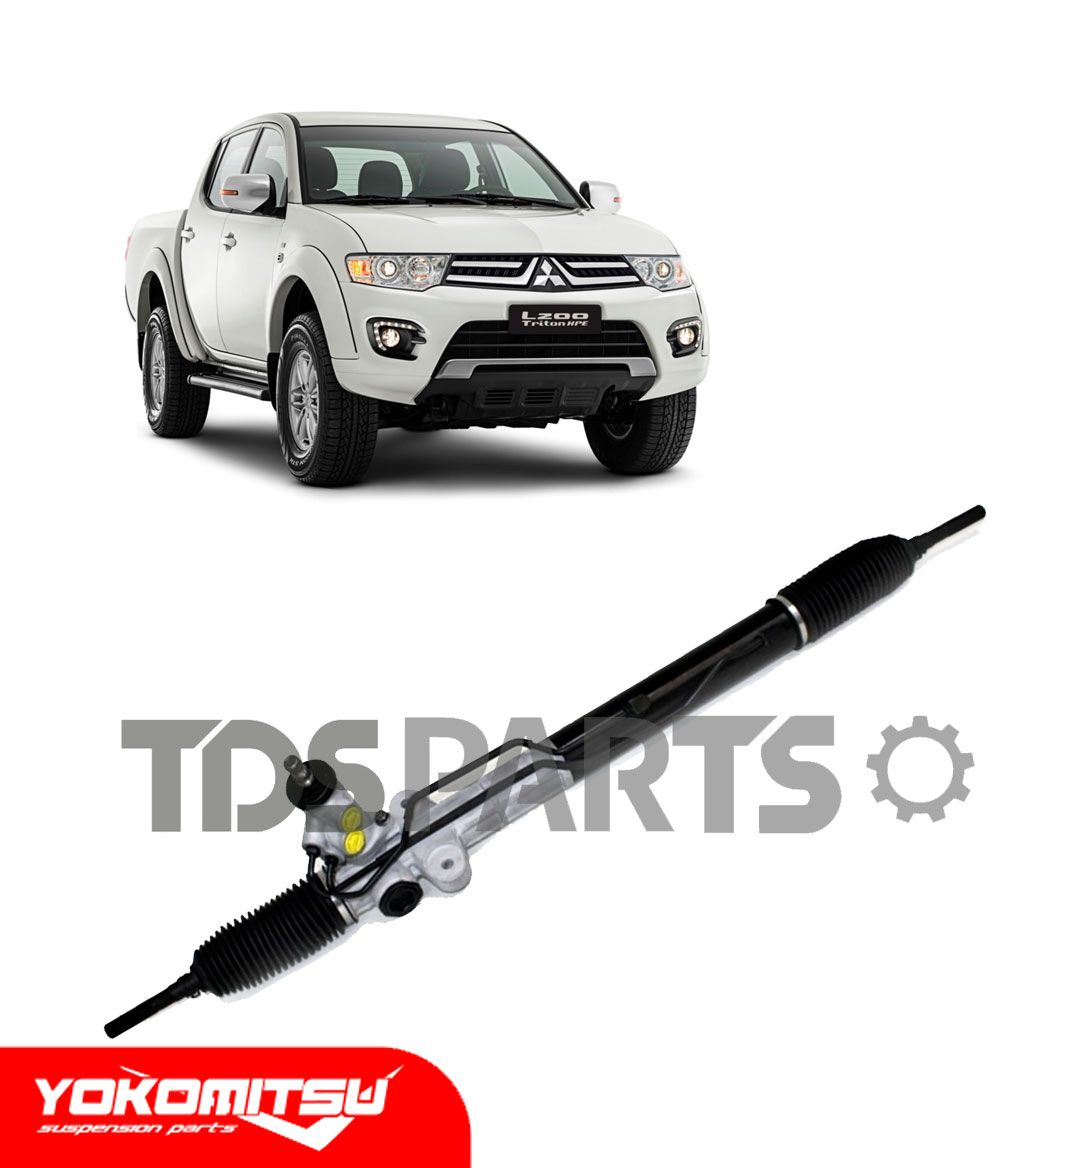 Caixa Direção Hidráulica Mitsubishi L200 Triton 4x4 | L200 Savana | Pajero Dakar